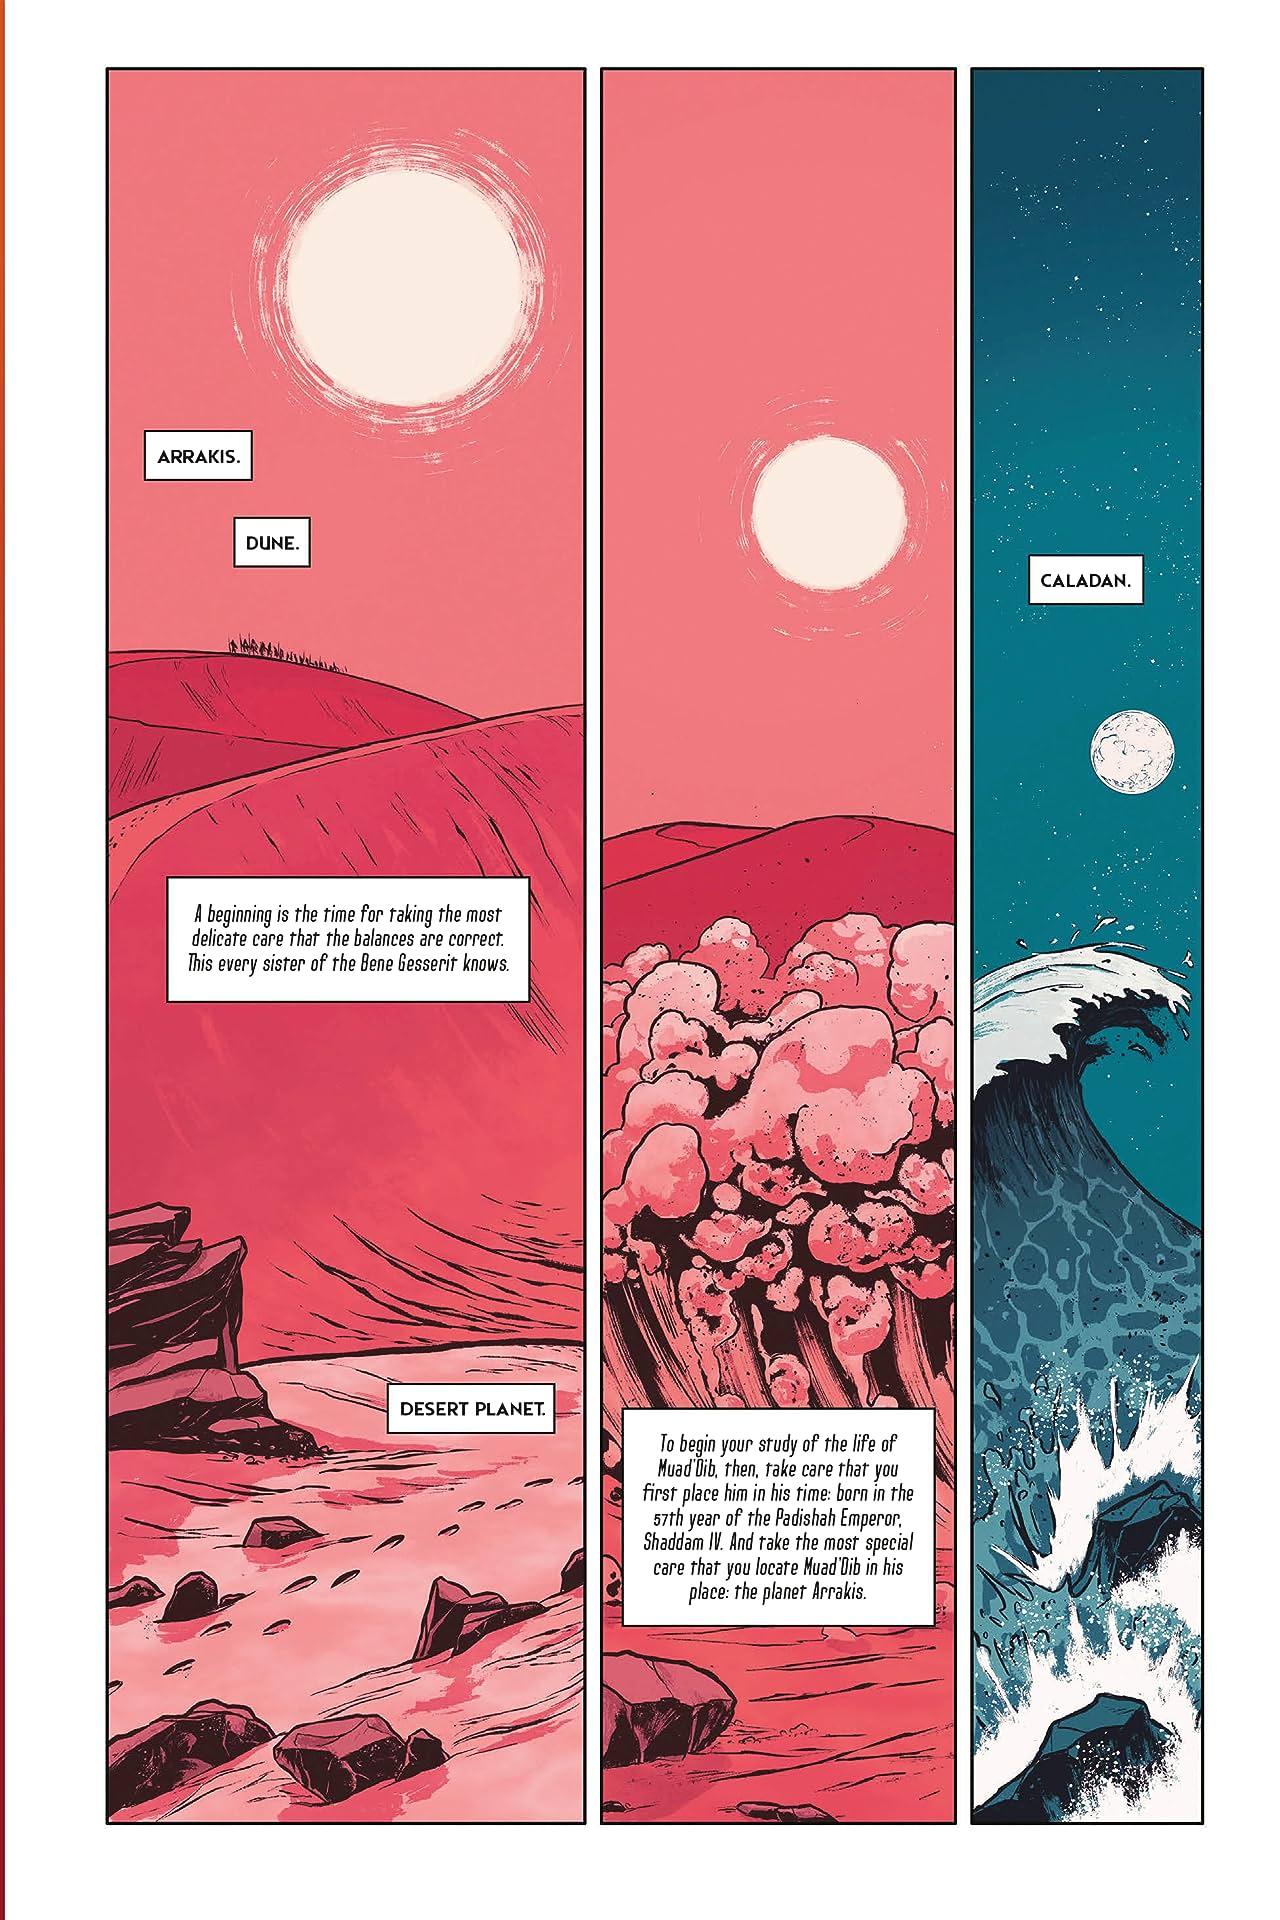 DUNE: The Graphic Novel